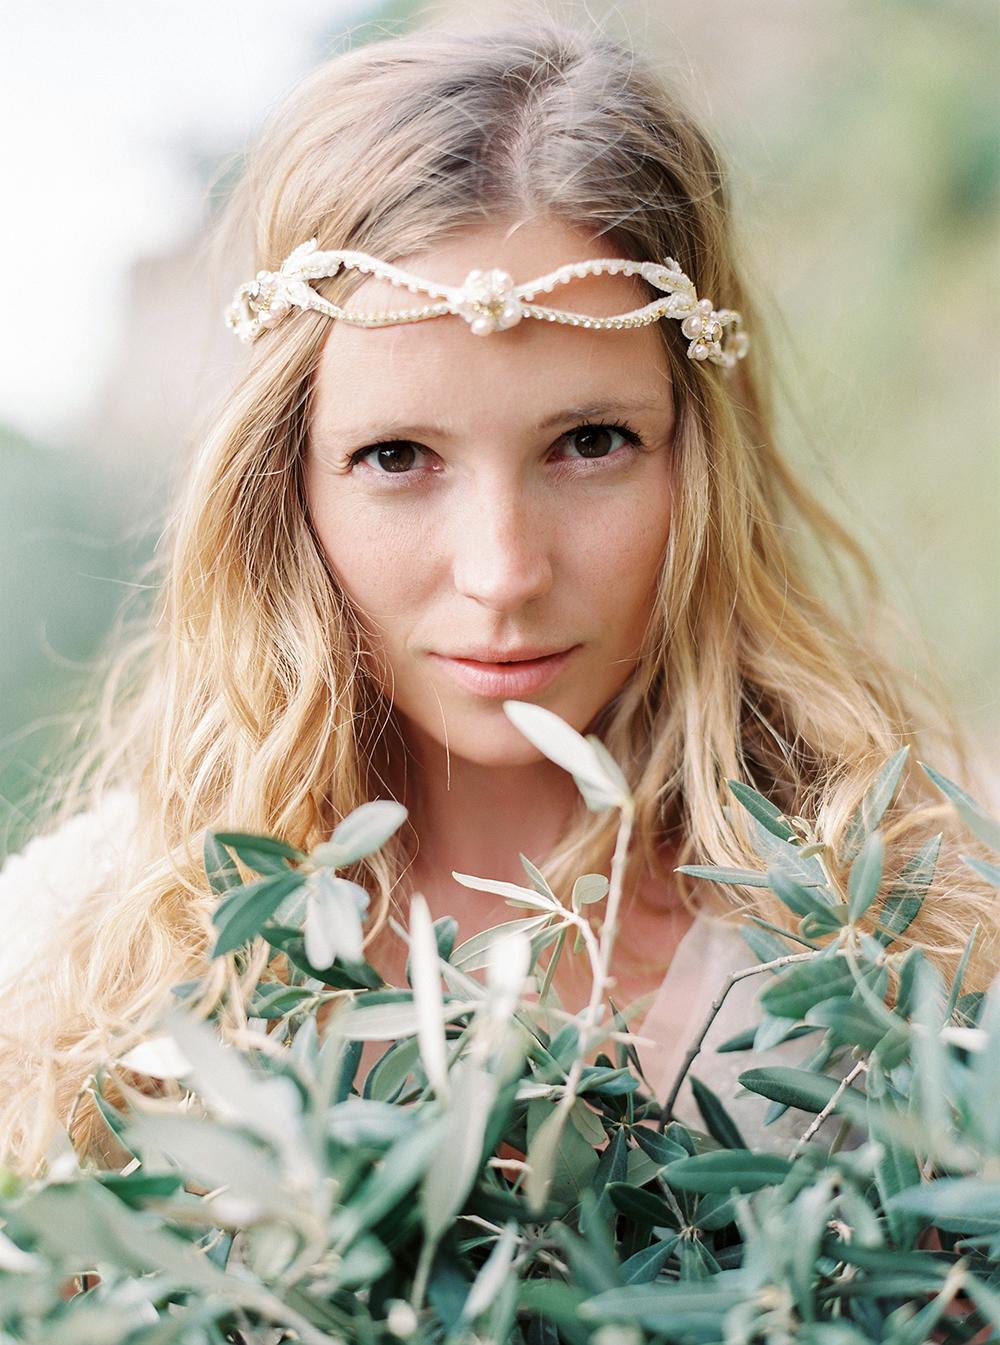 Olga_Plakitina_Photography_013.jpg